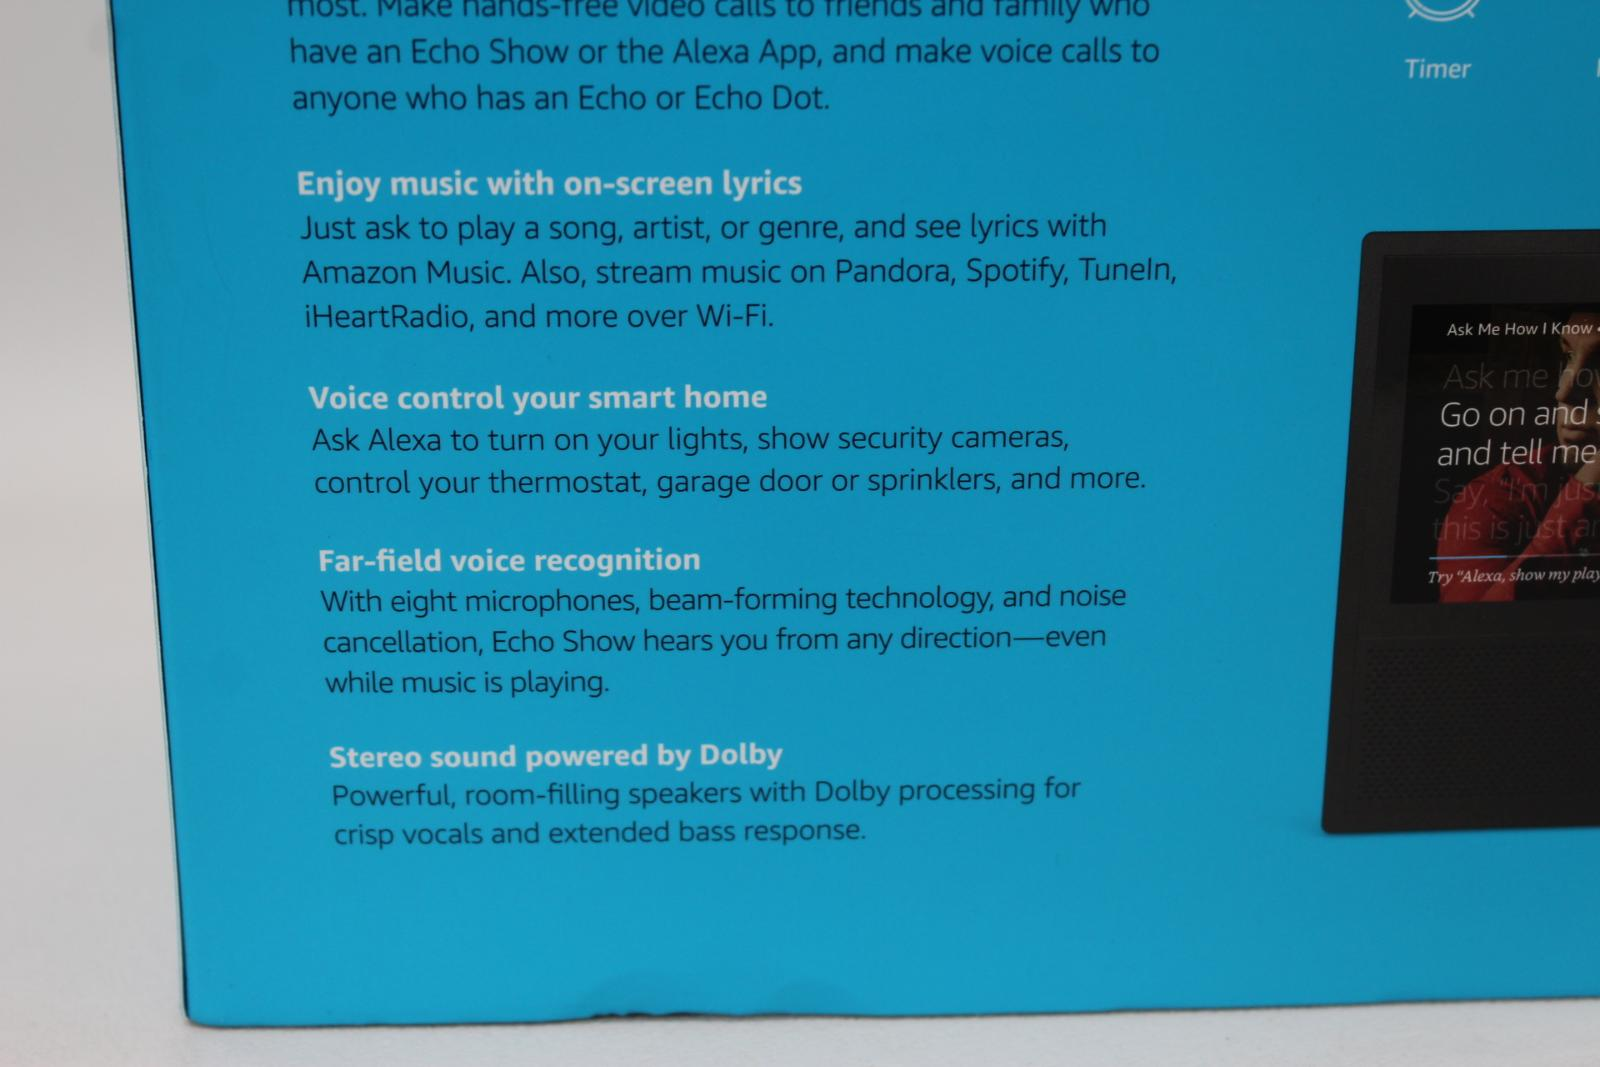 AMAZON-Echo-Show-Alexa-Smart-Assistant-Black-1st-Generation-7-034-Display-NEW thumbnail 7